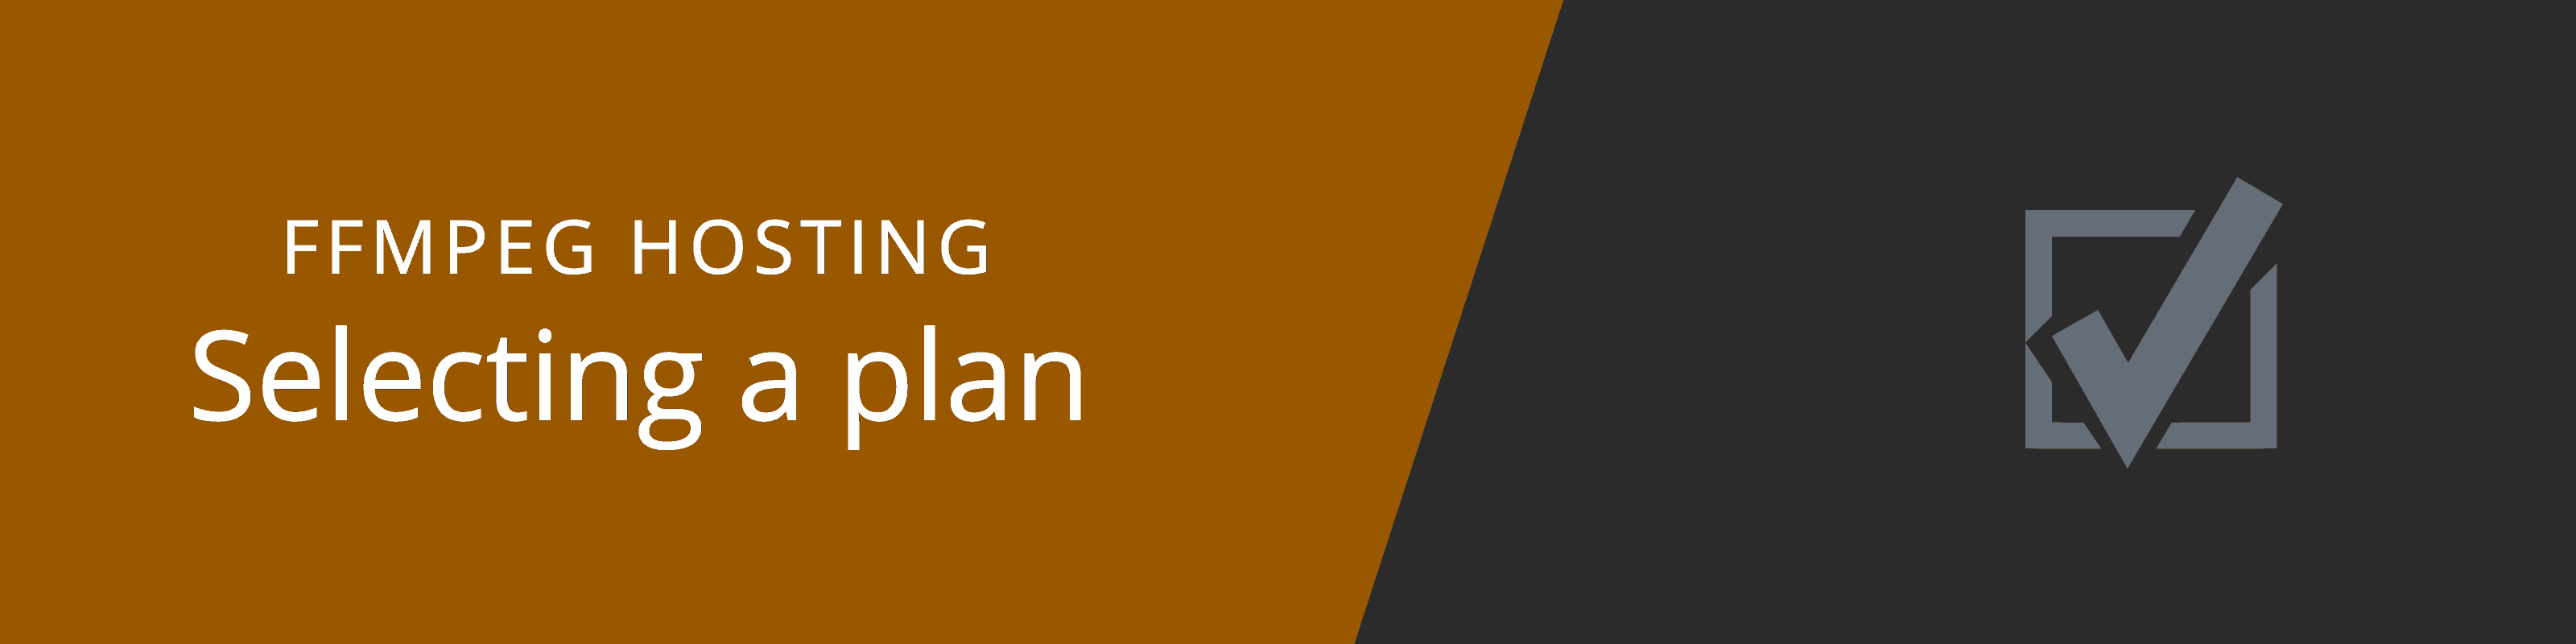 choosing ffmpeg hosting plan